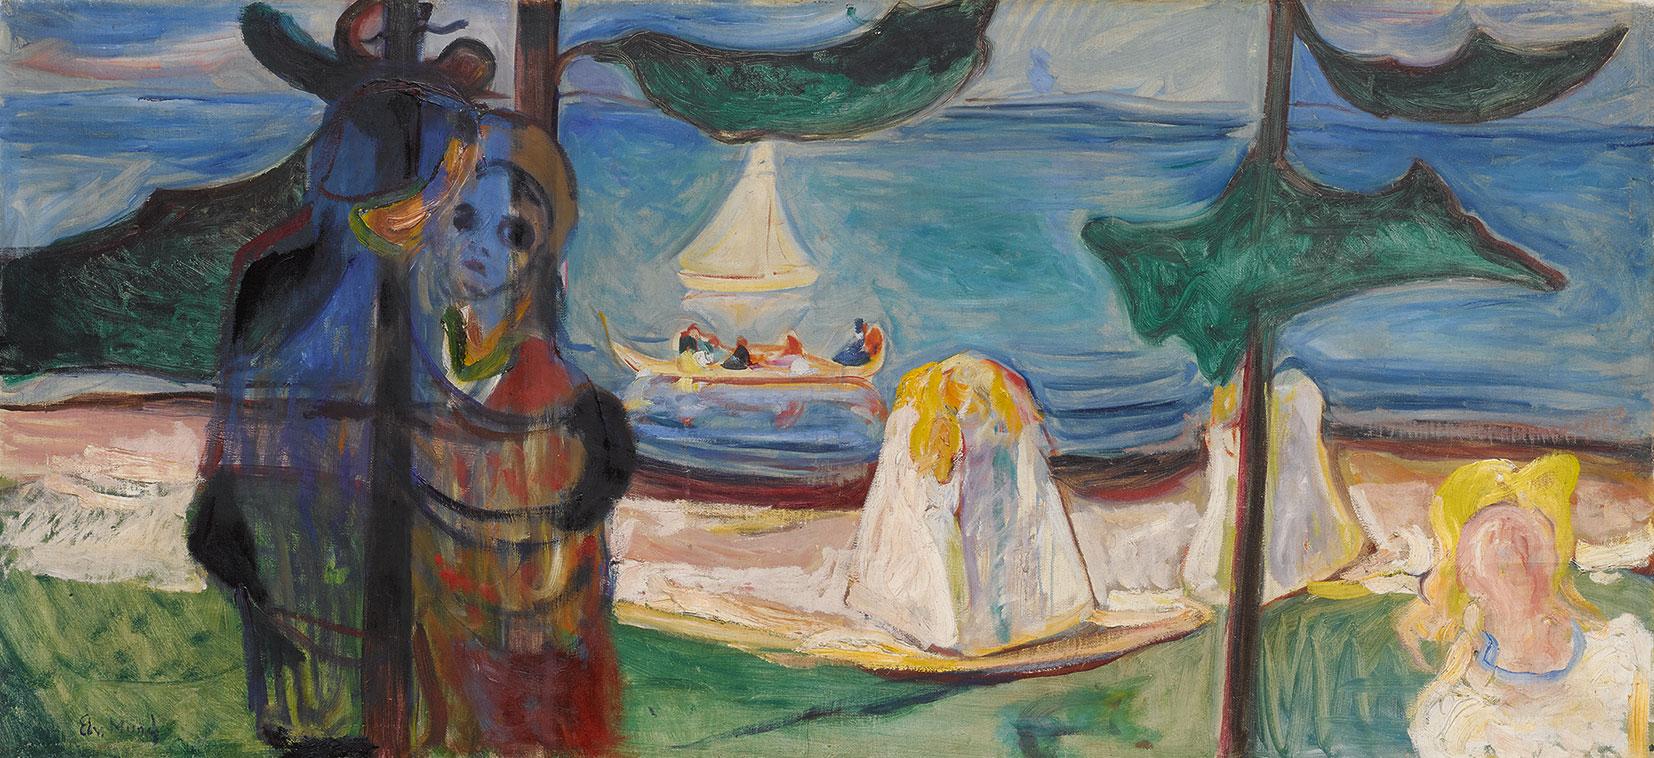 Lot-115,-Edvard-Munch,-Embrace-on-the-Beach-(The-Linde-Frieze),-est.jpg